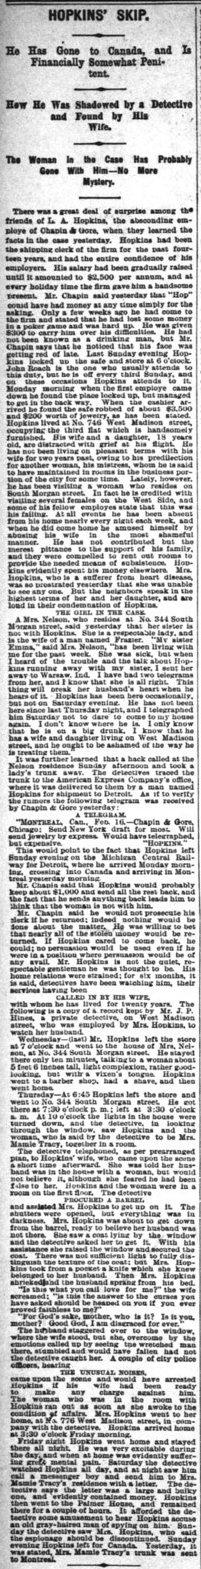 hopkins-skip-chi-inter-ocean-2-17-1886-pg-8-3